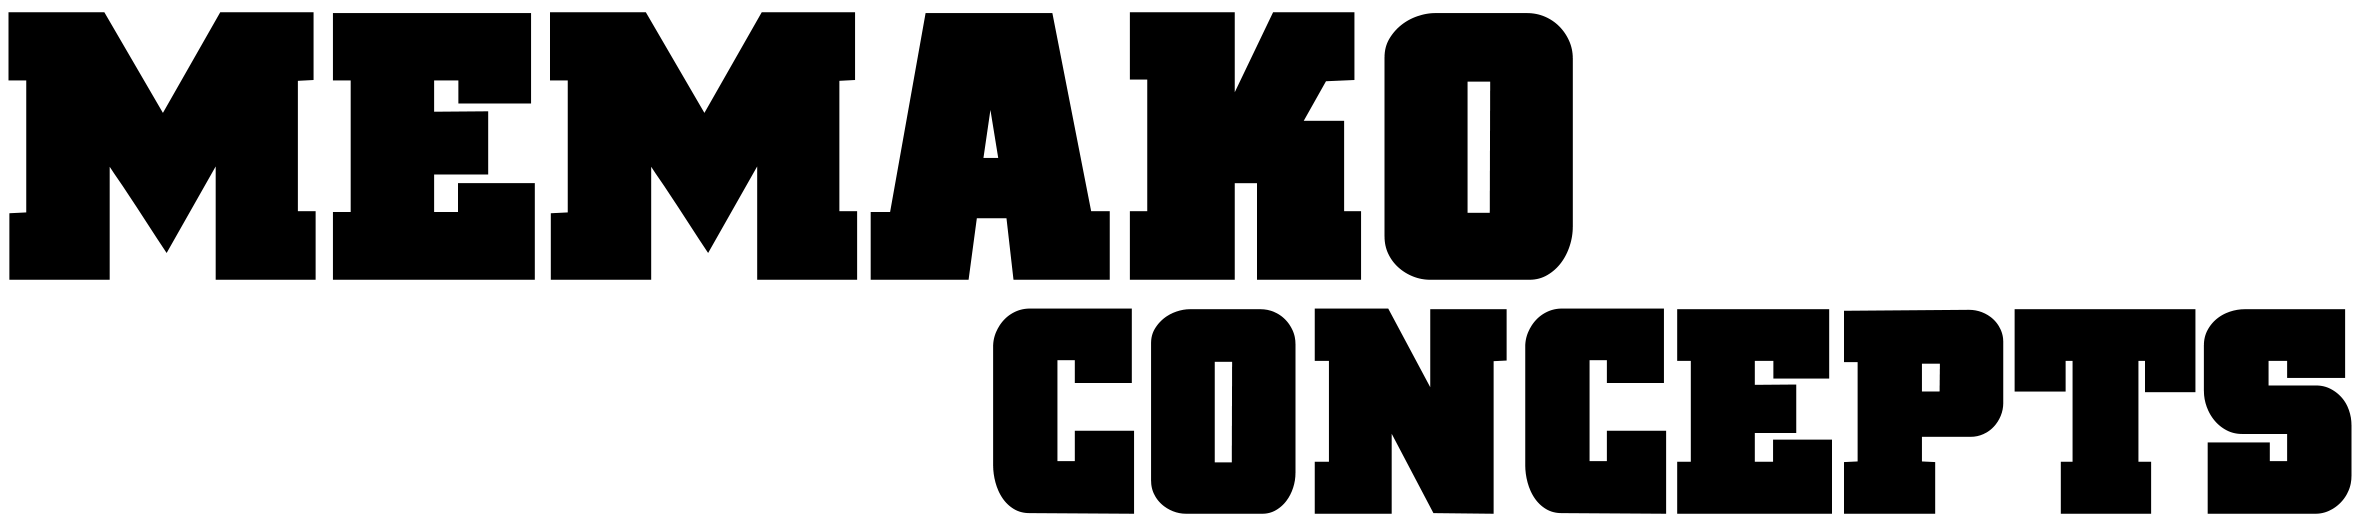 Memako Concepts Logo